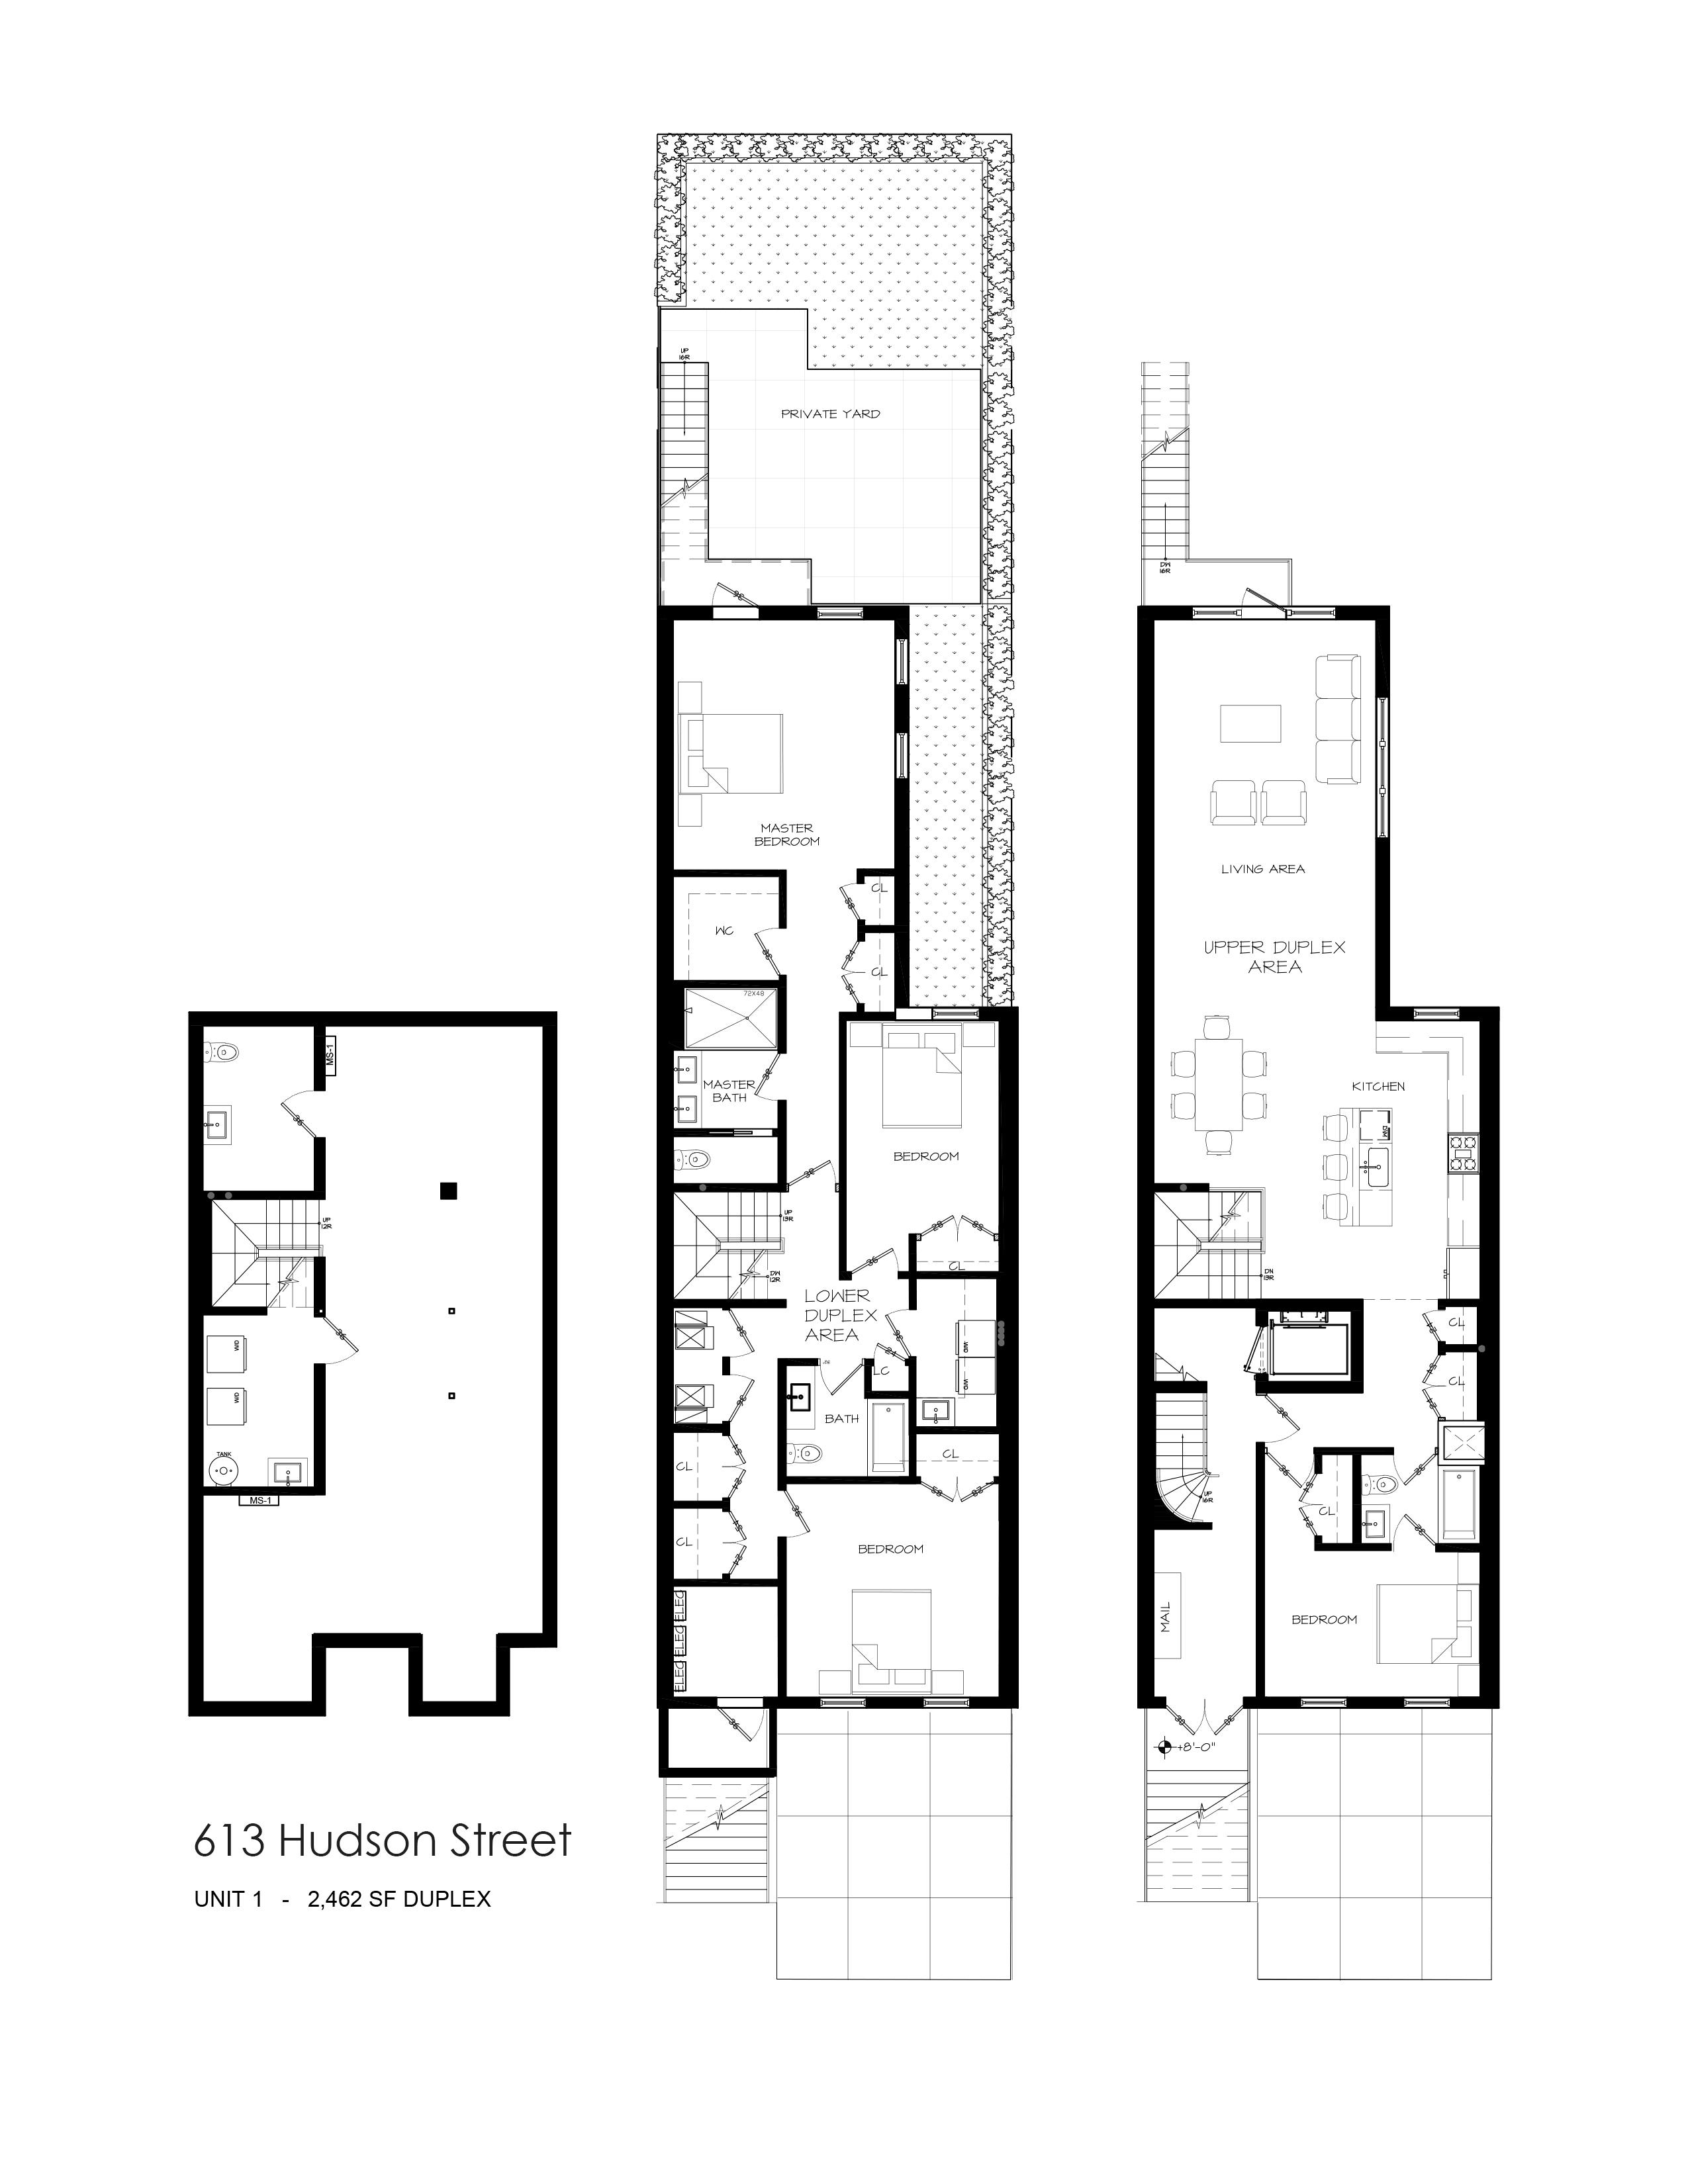 613 Hudson Unit 1